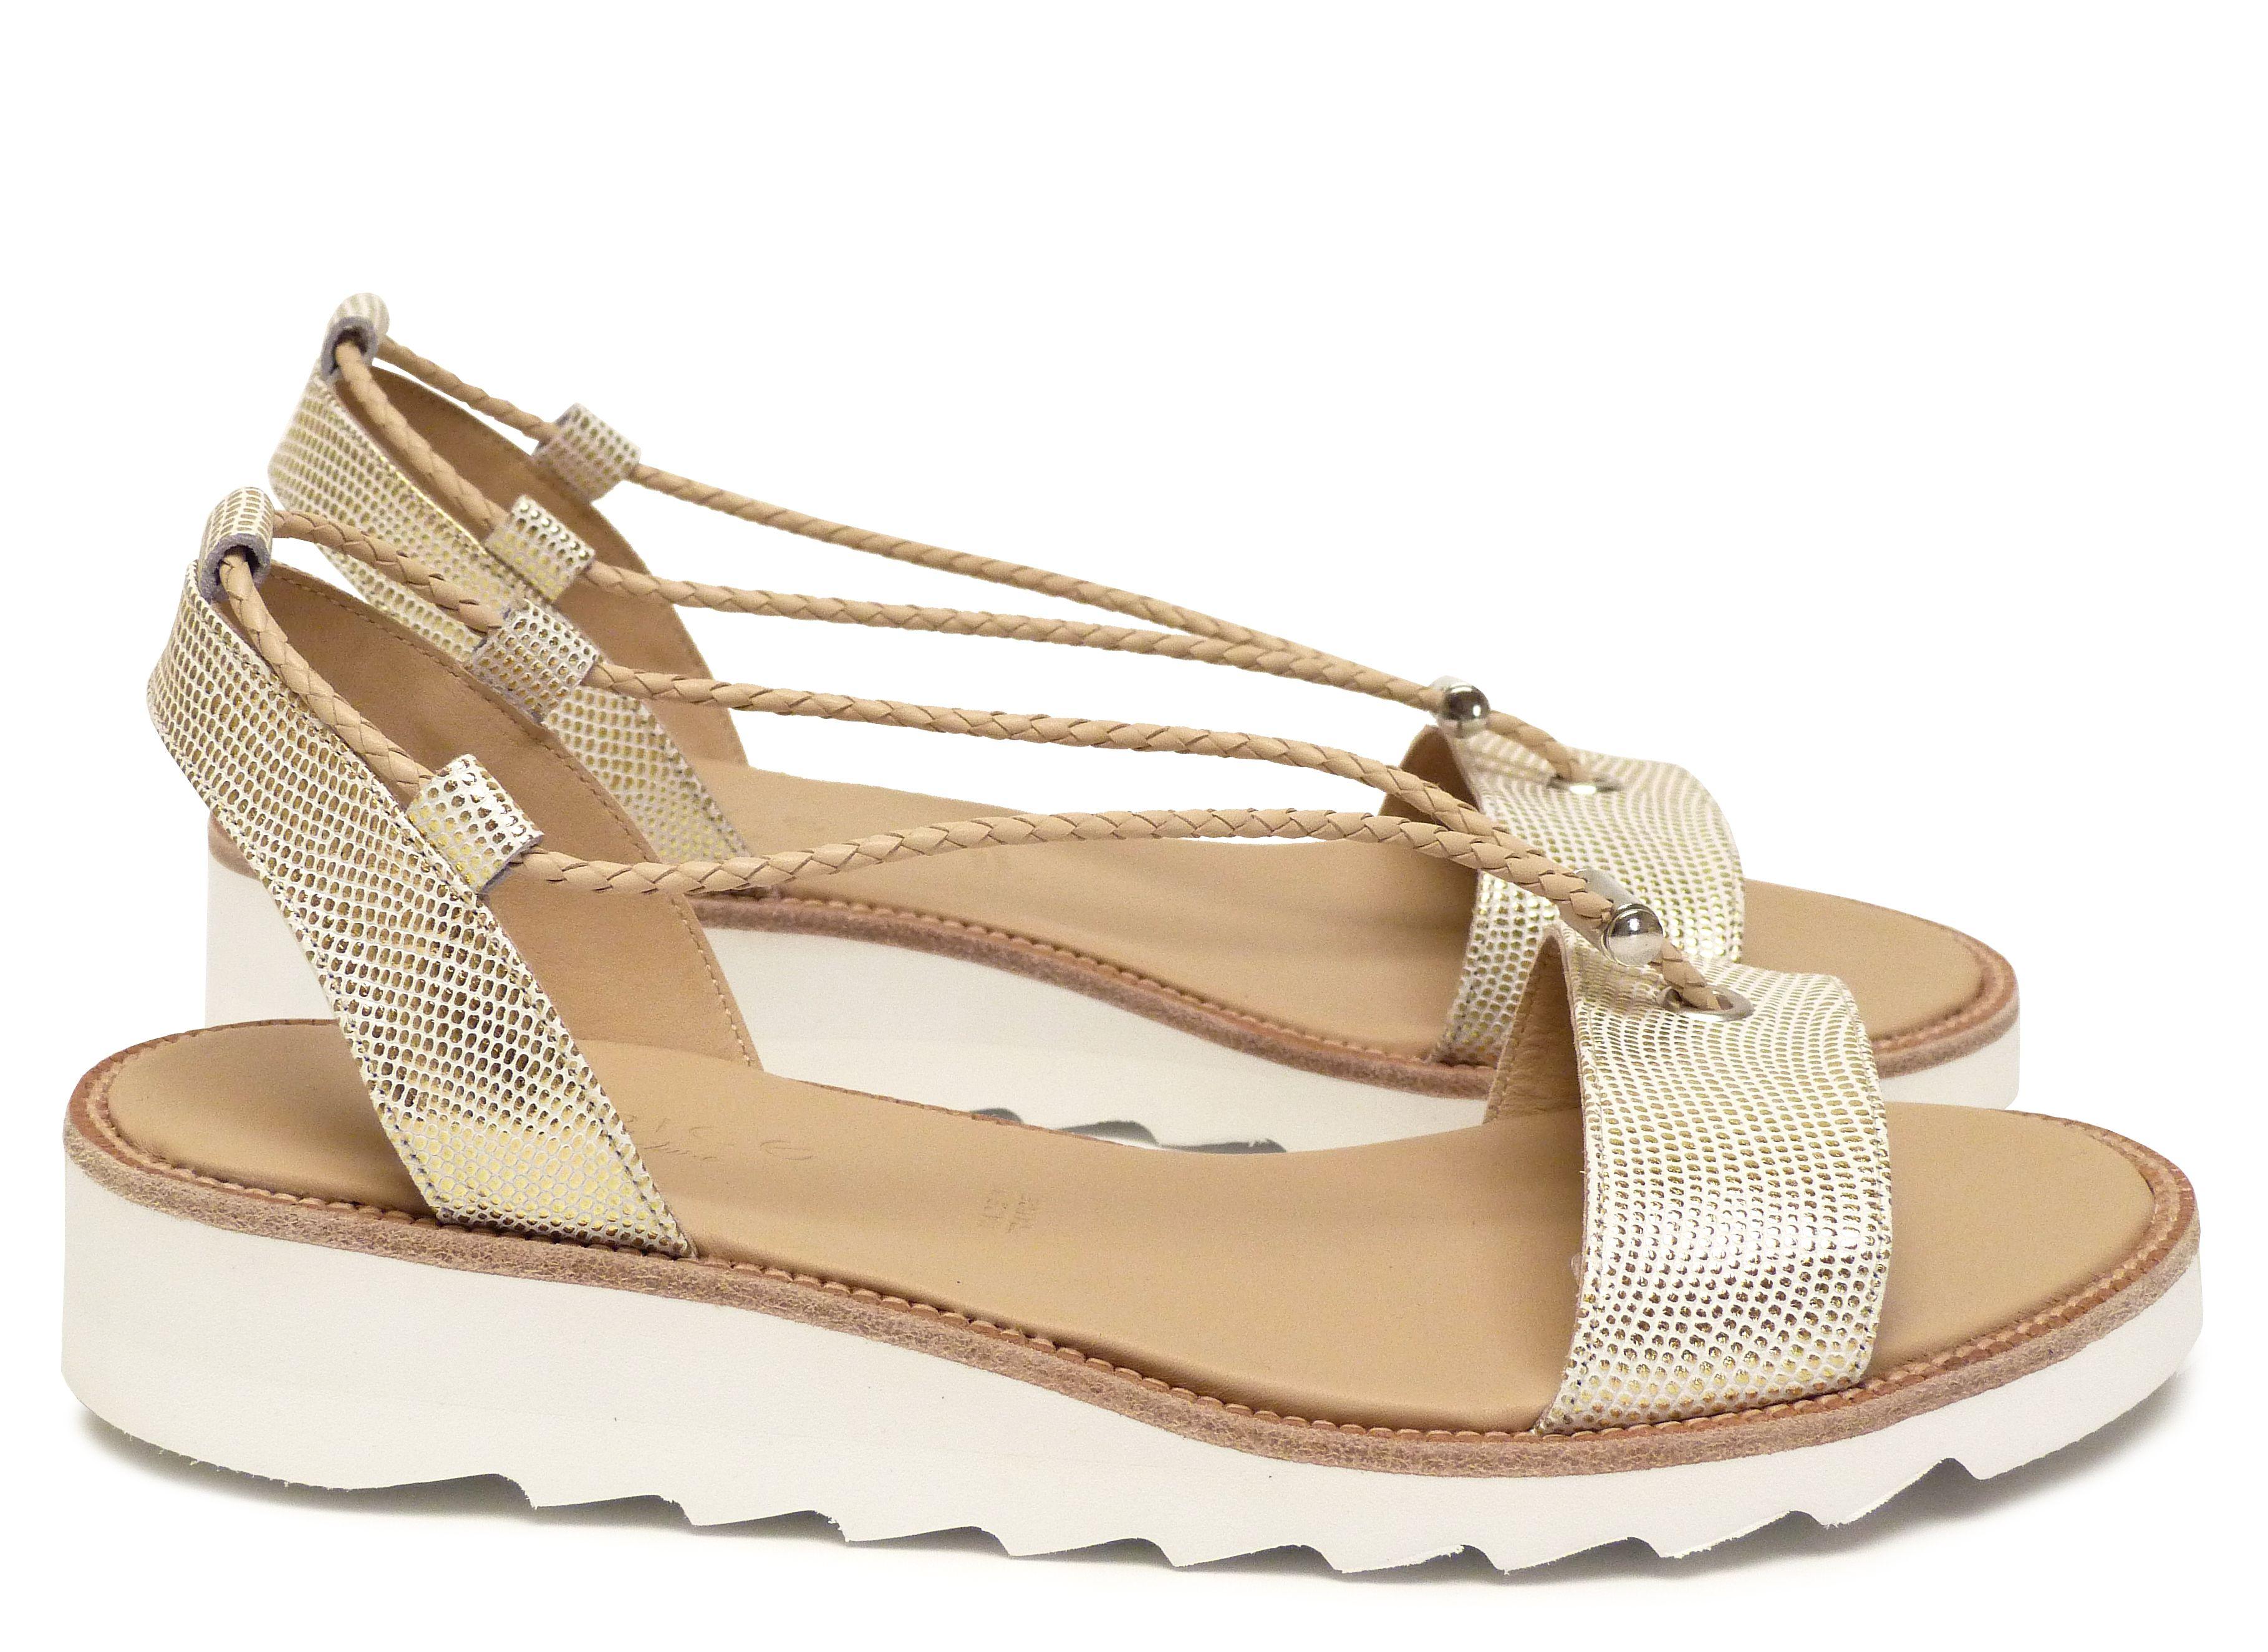 6c072e62b6d Chaussures Femme Sandales Printemps Ete 2015 Maurice Manufacture BOSS Cuir  razza blanc or